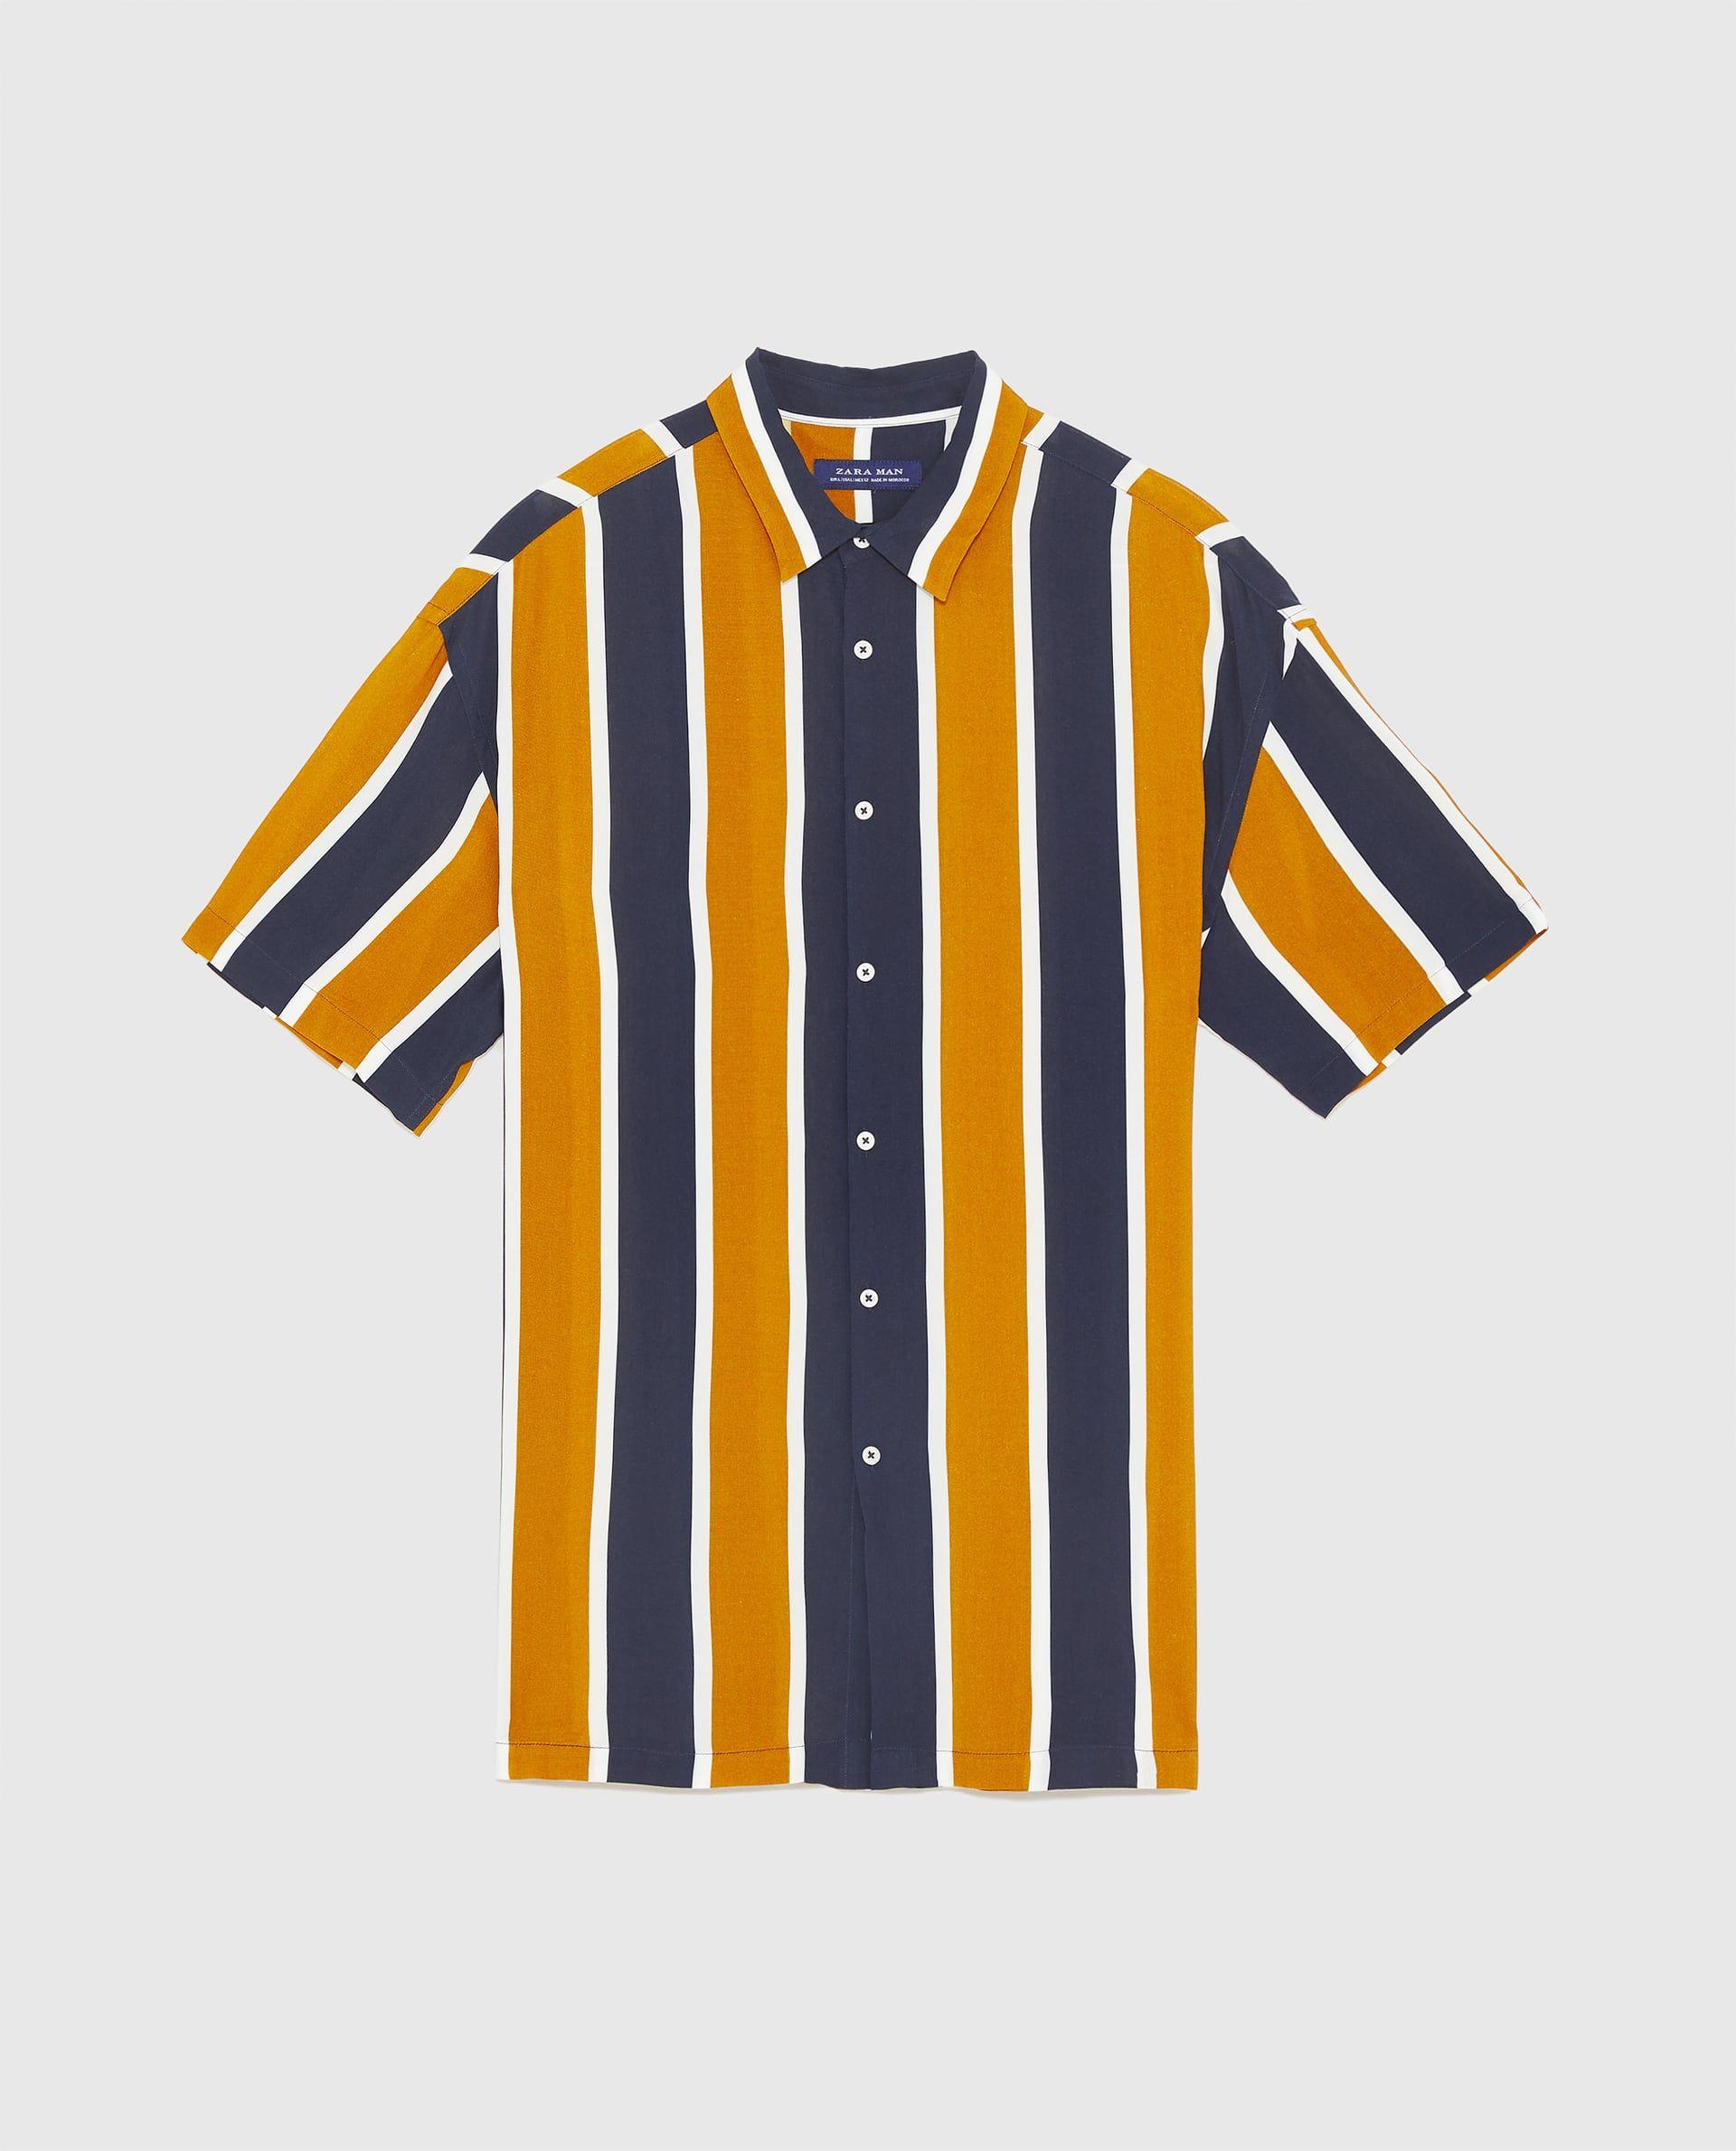 Verticales Vertical Shirts Rayas 2019 Camisa Fluida En Stripes ExZw0zq7